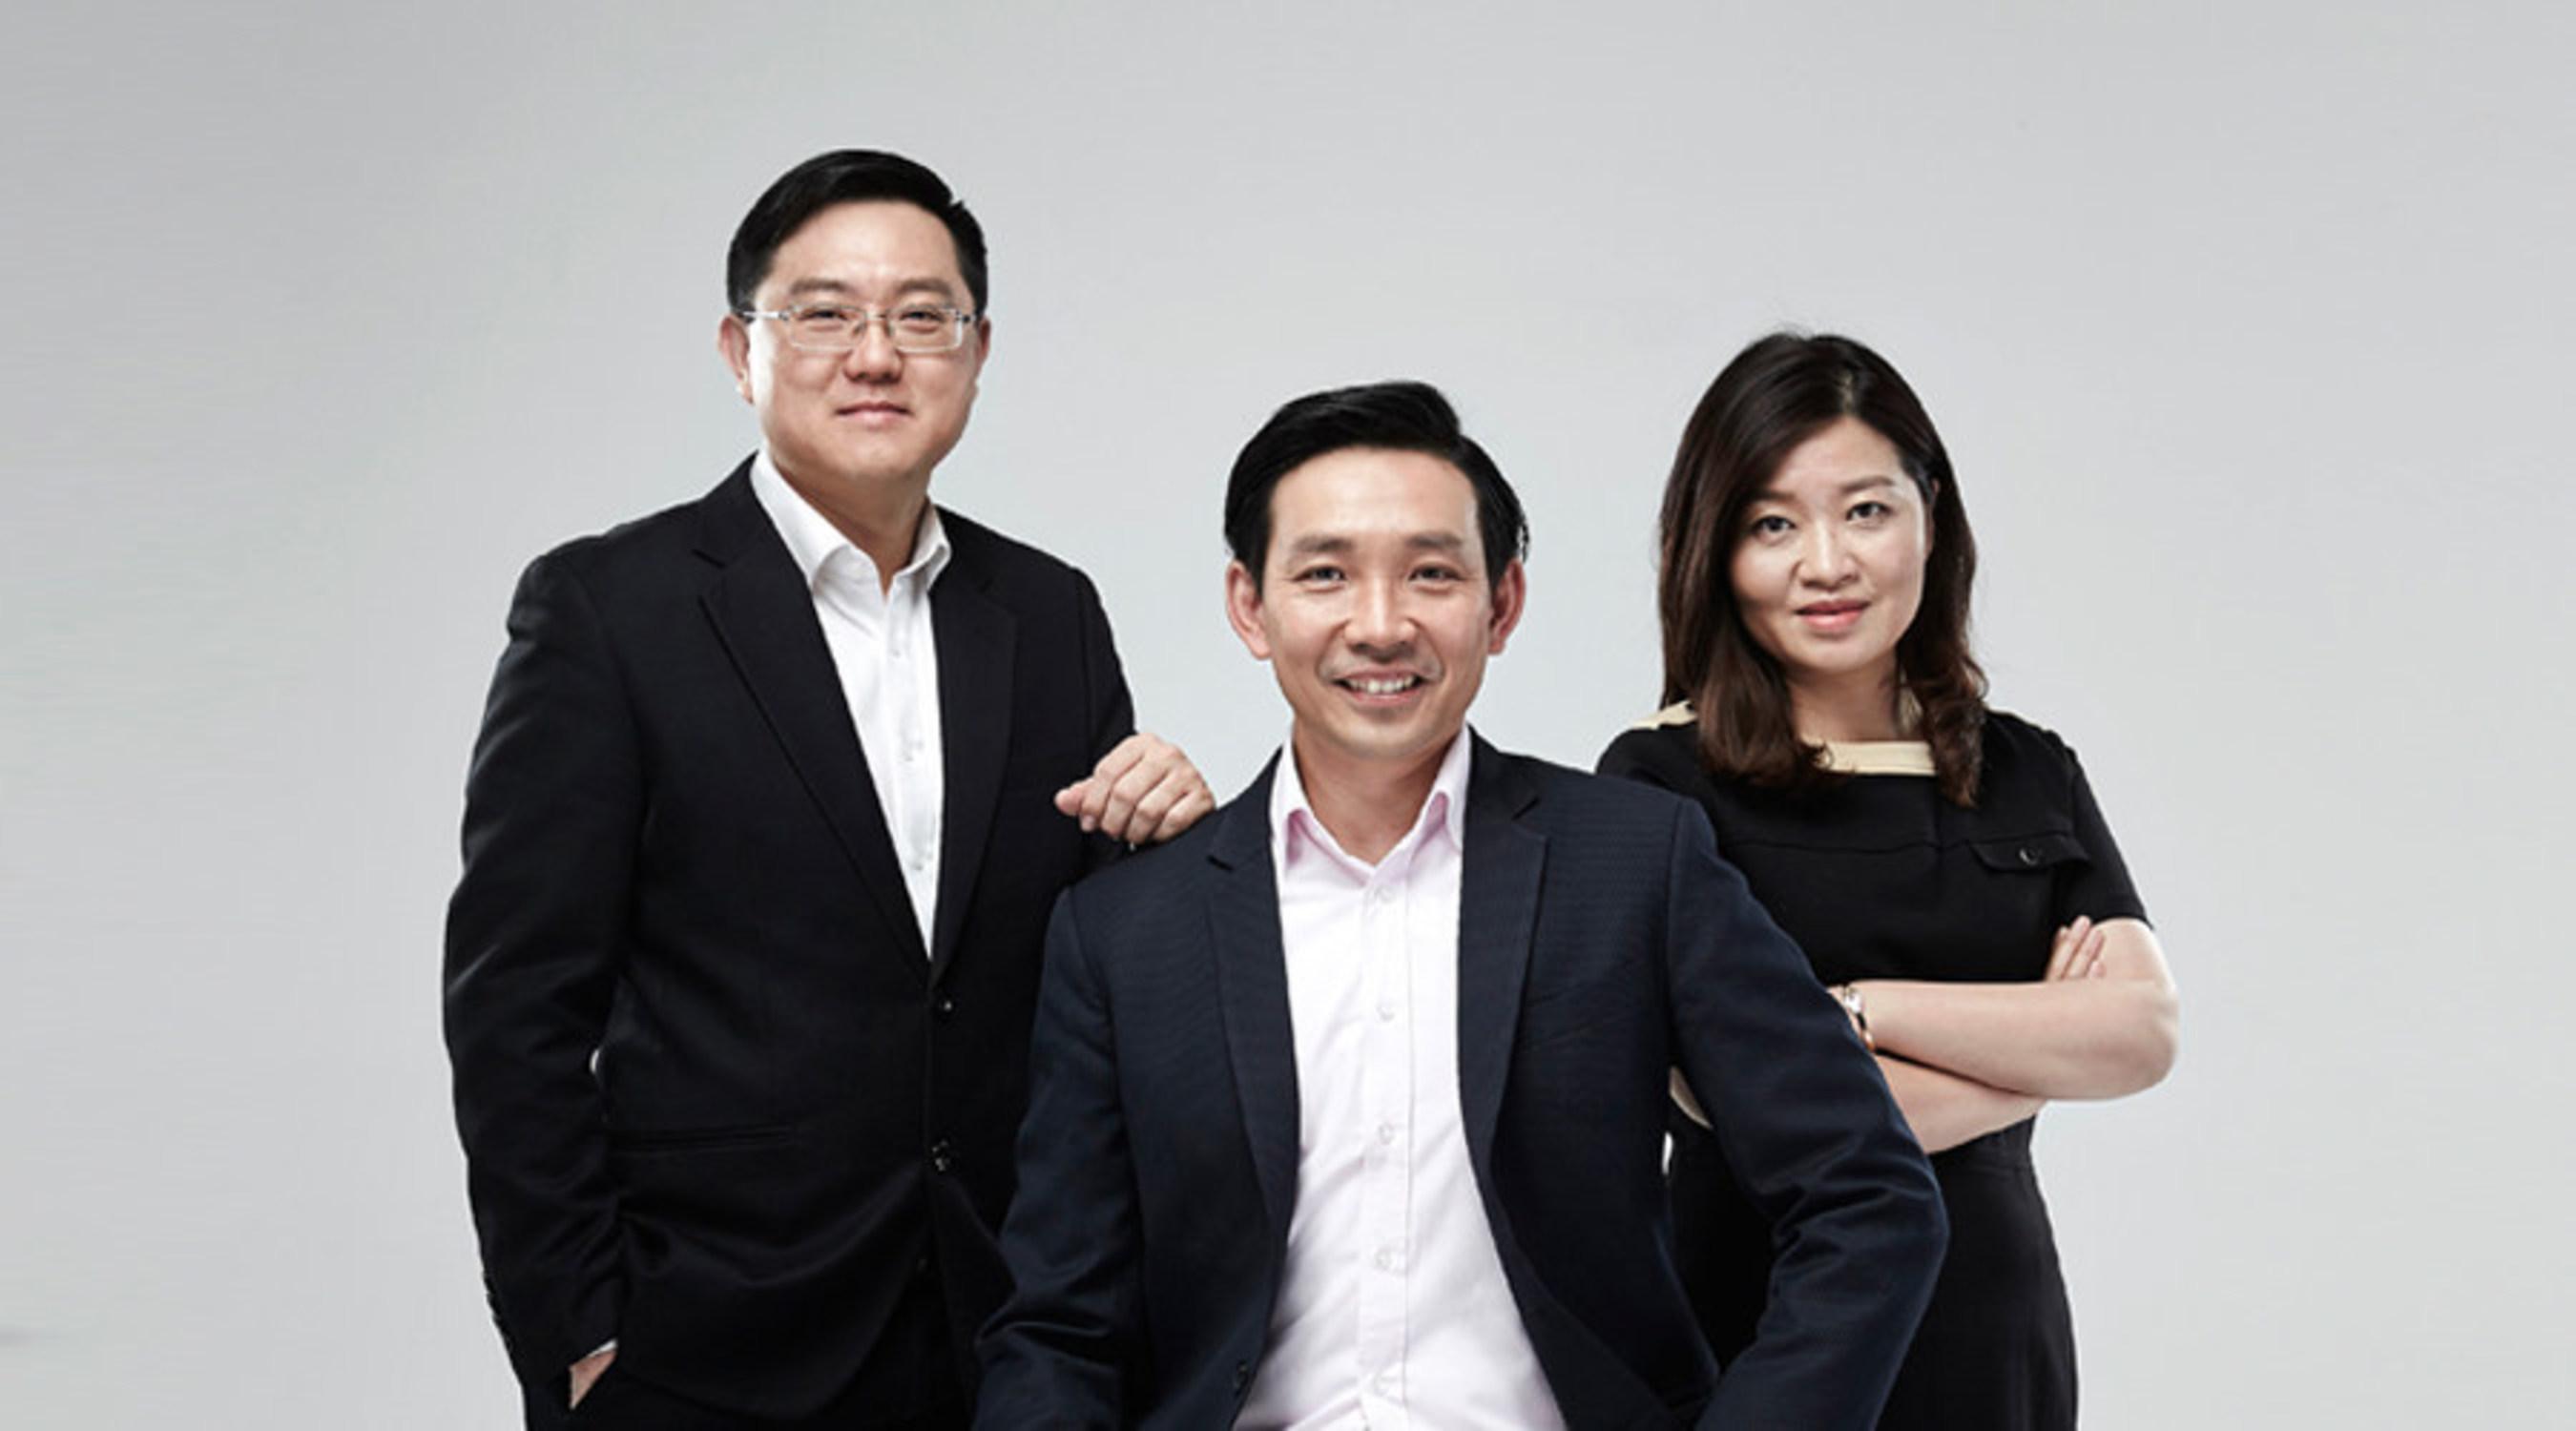 The Arrival of Three Senior Banking Executives